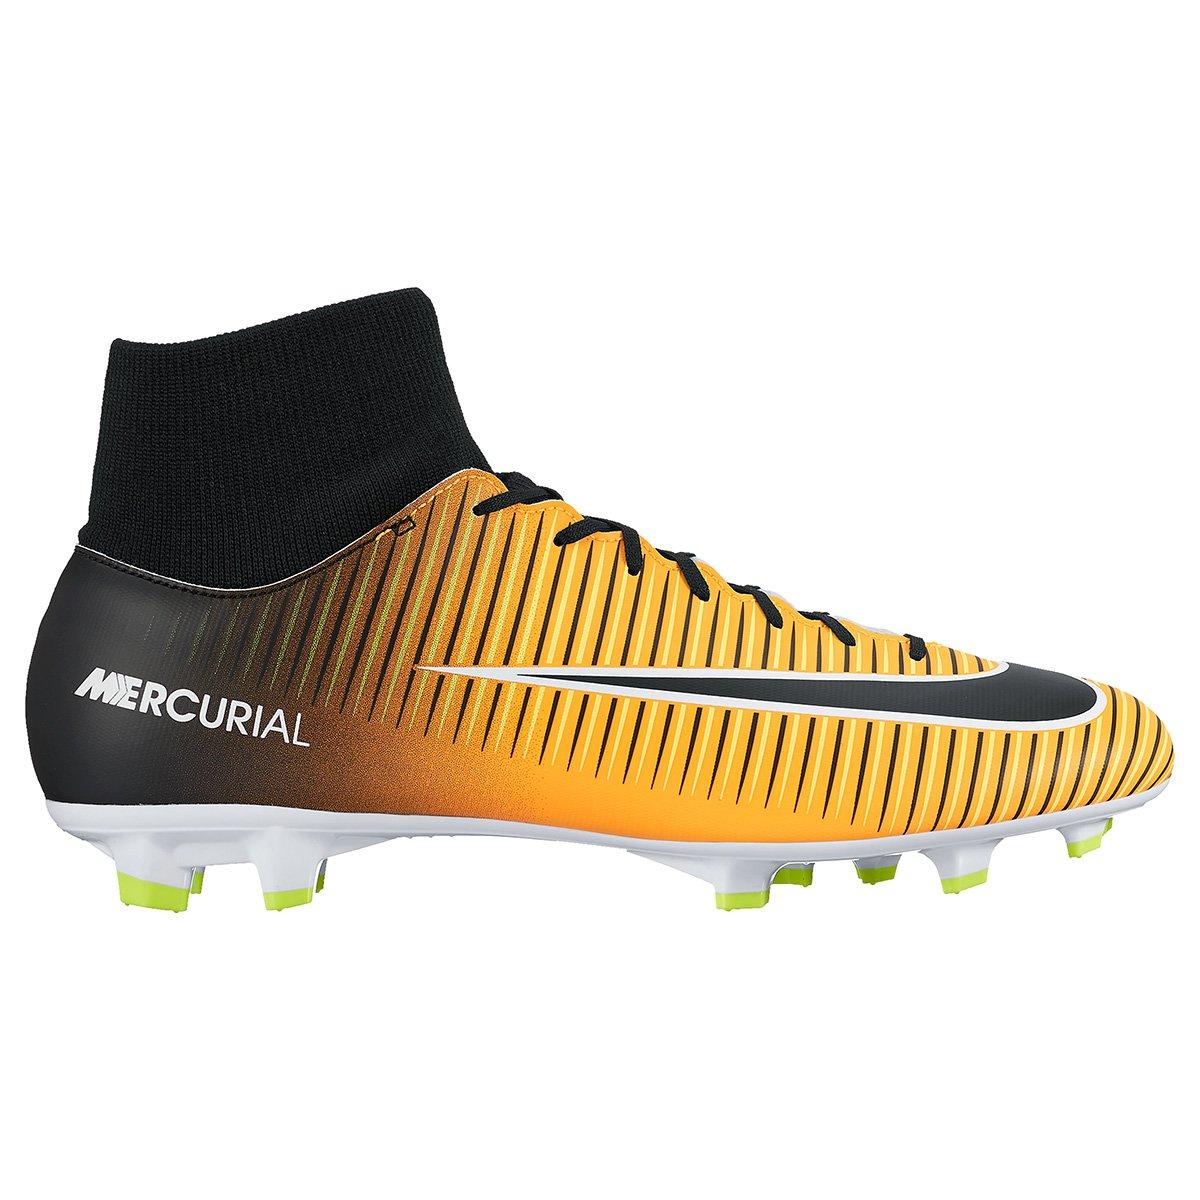 3aecdaa0b2 Chuteira Campo Nike Mercurial Victory 6 Dynamic Fit FG Masculina ...